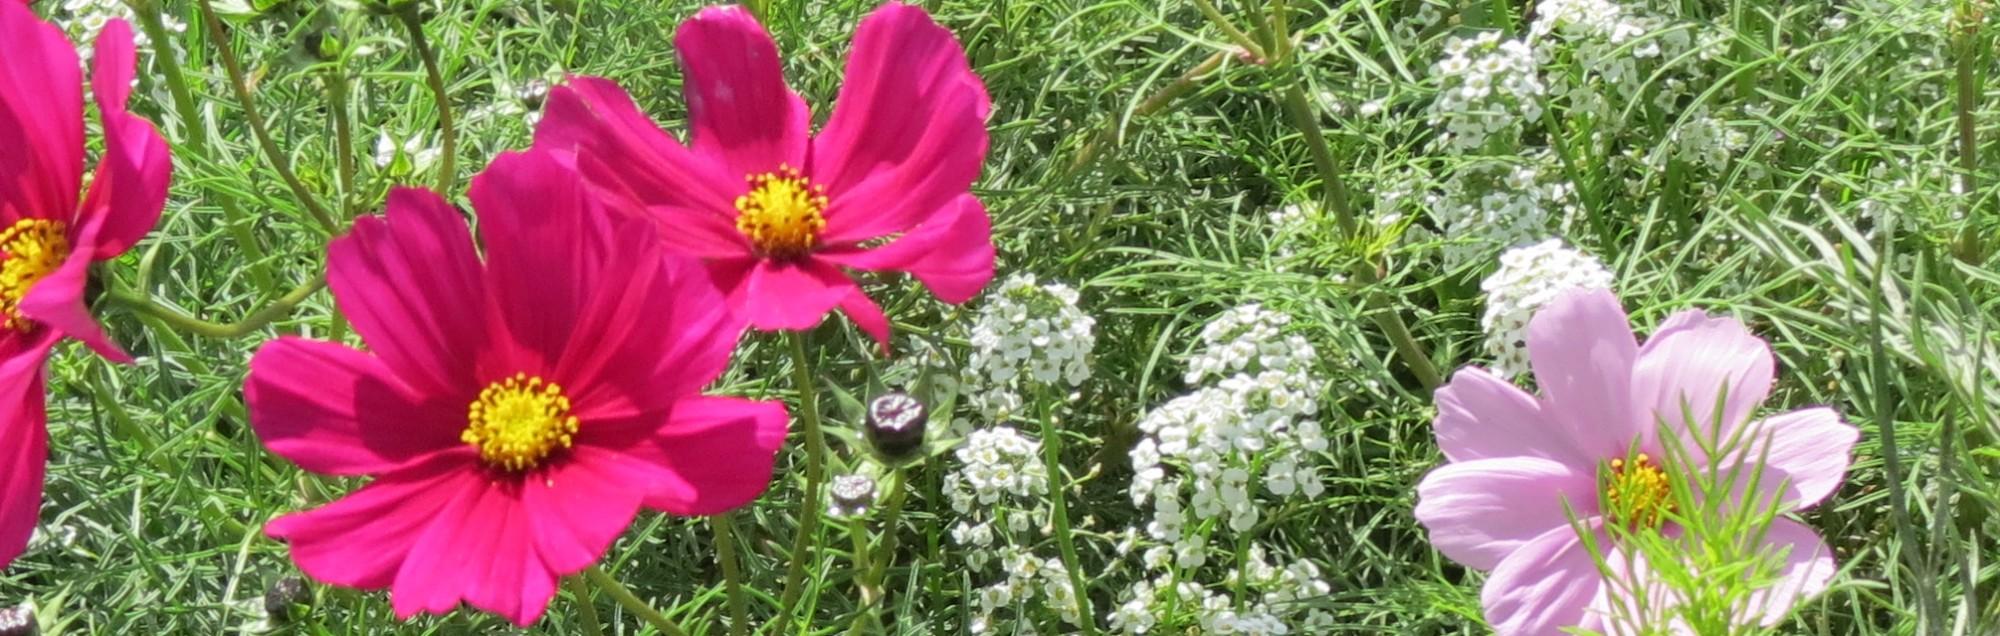 Wild_red_flowers